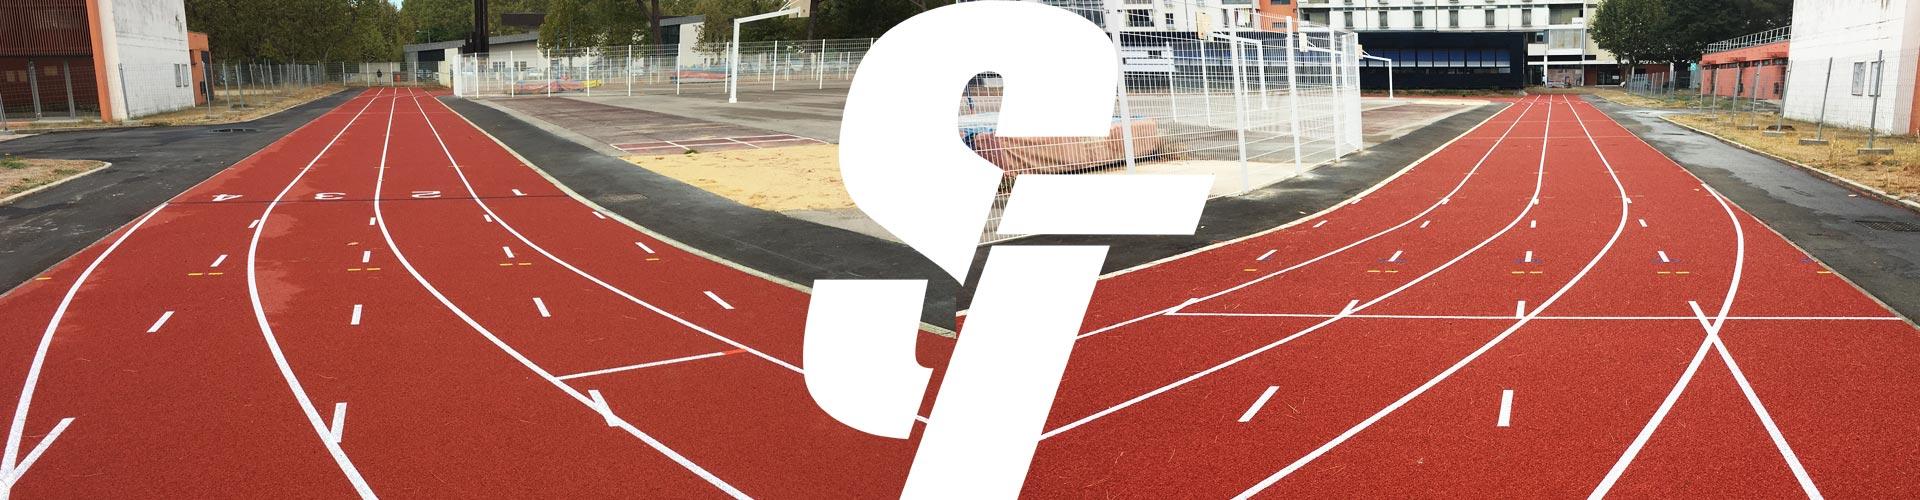 Piste athlétisme 2 –  LYCEE JEAN MERMOZ – MONTPELLIER (34)